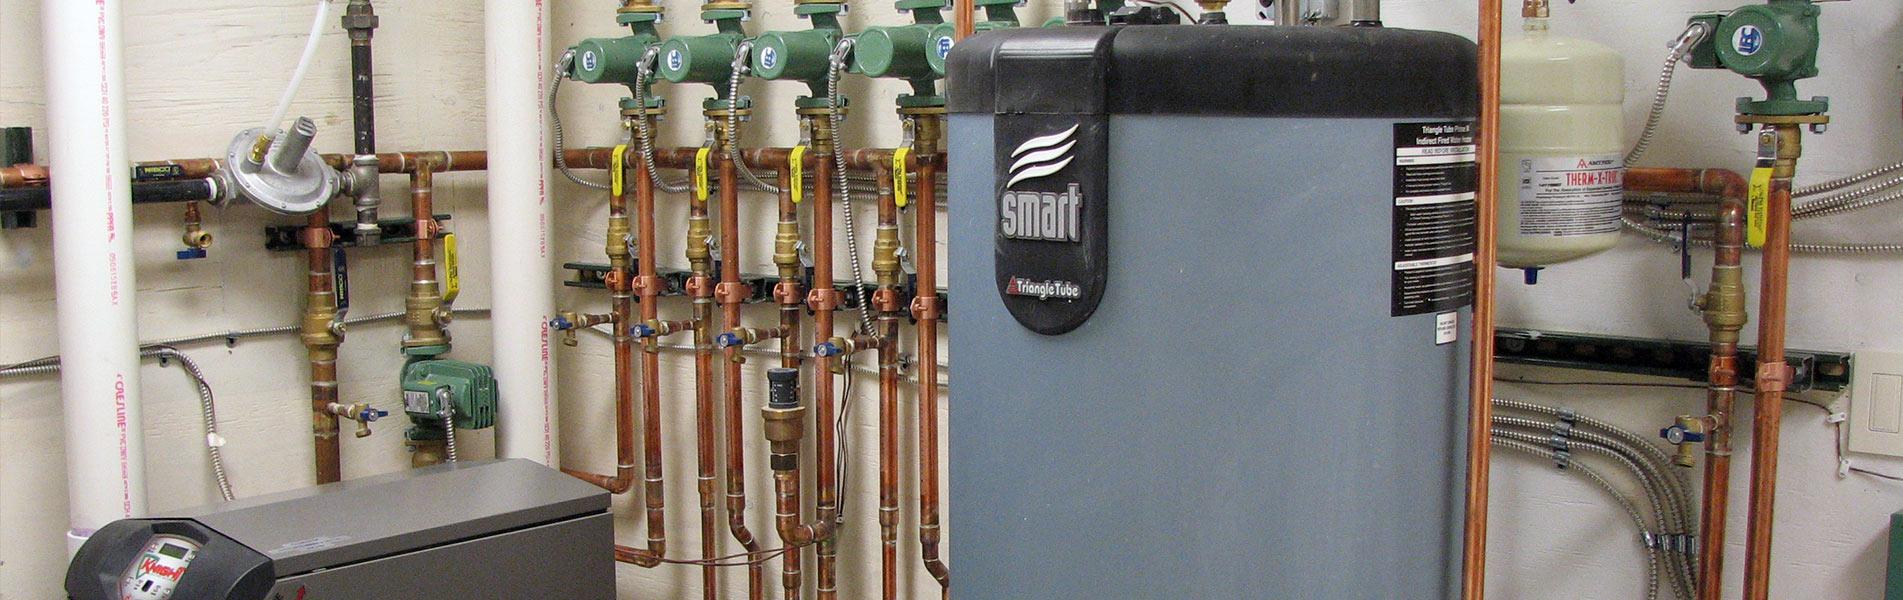 Hydronic Heating In Casper Wy Heated Floors Installation